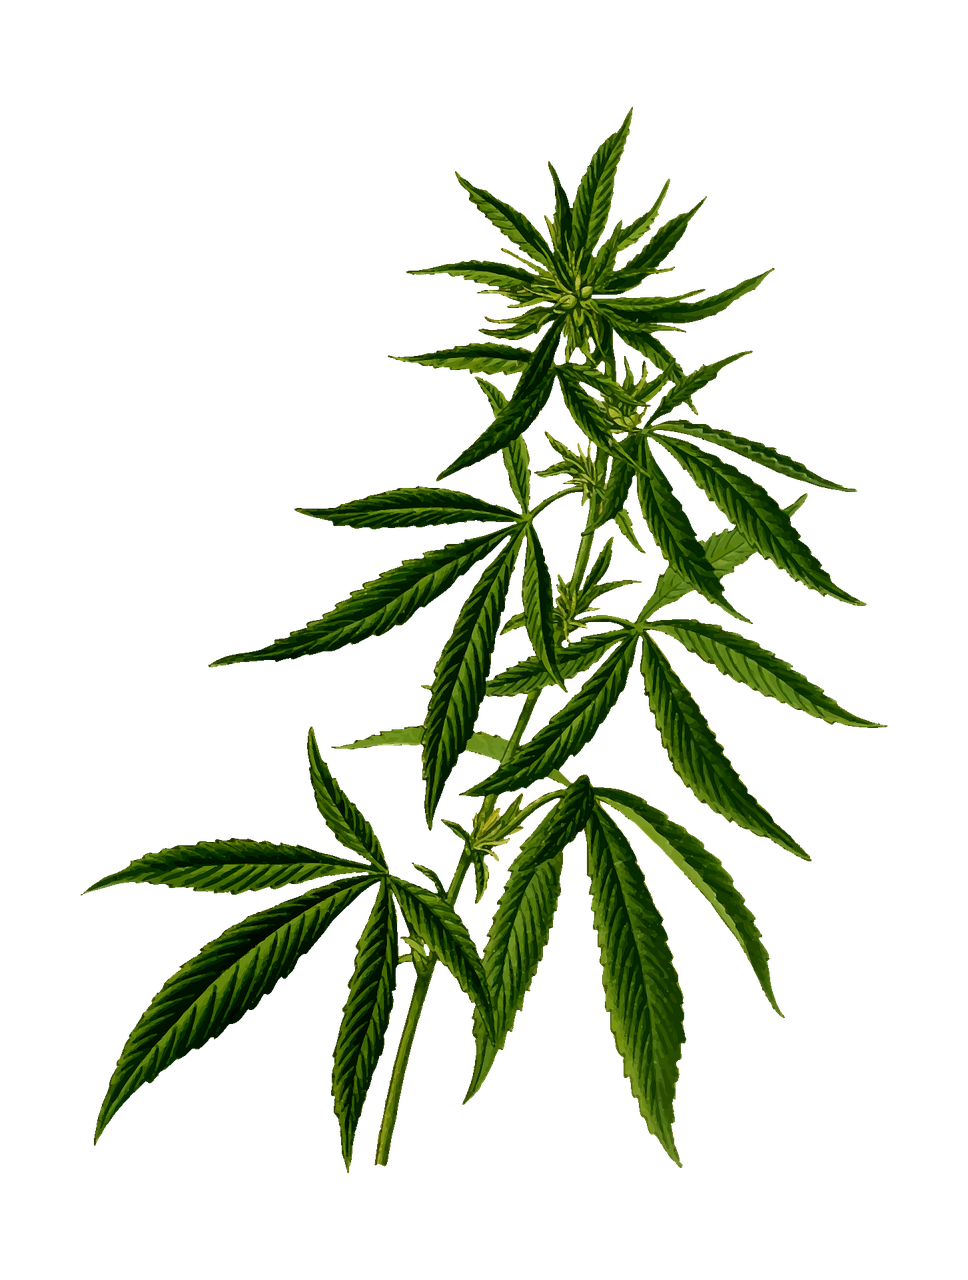 cannabis-2028244_1280 - Jenna Liut